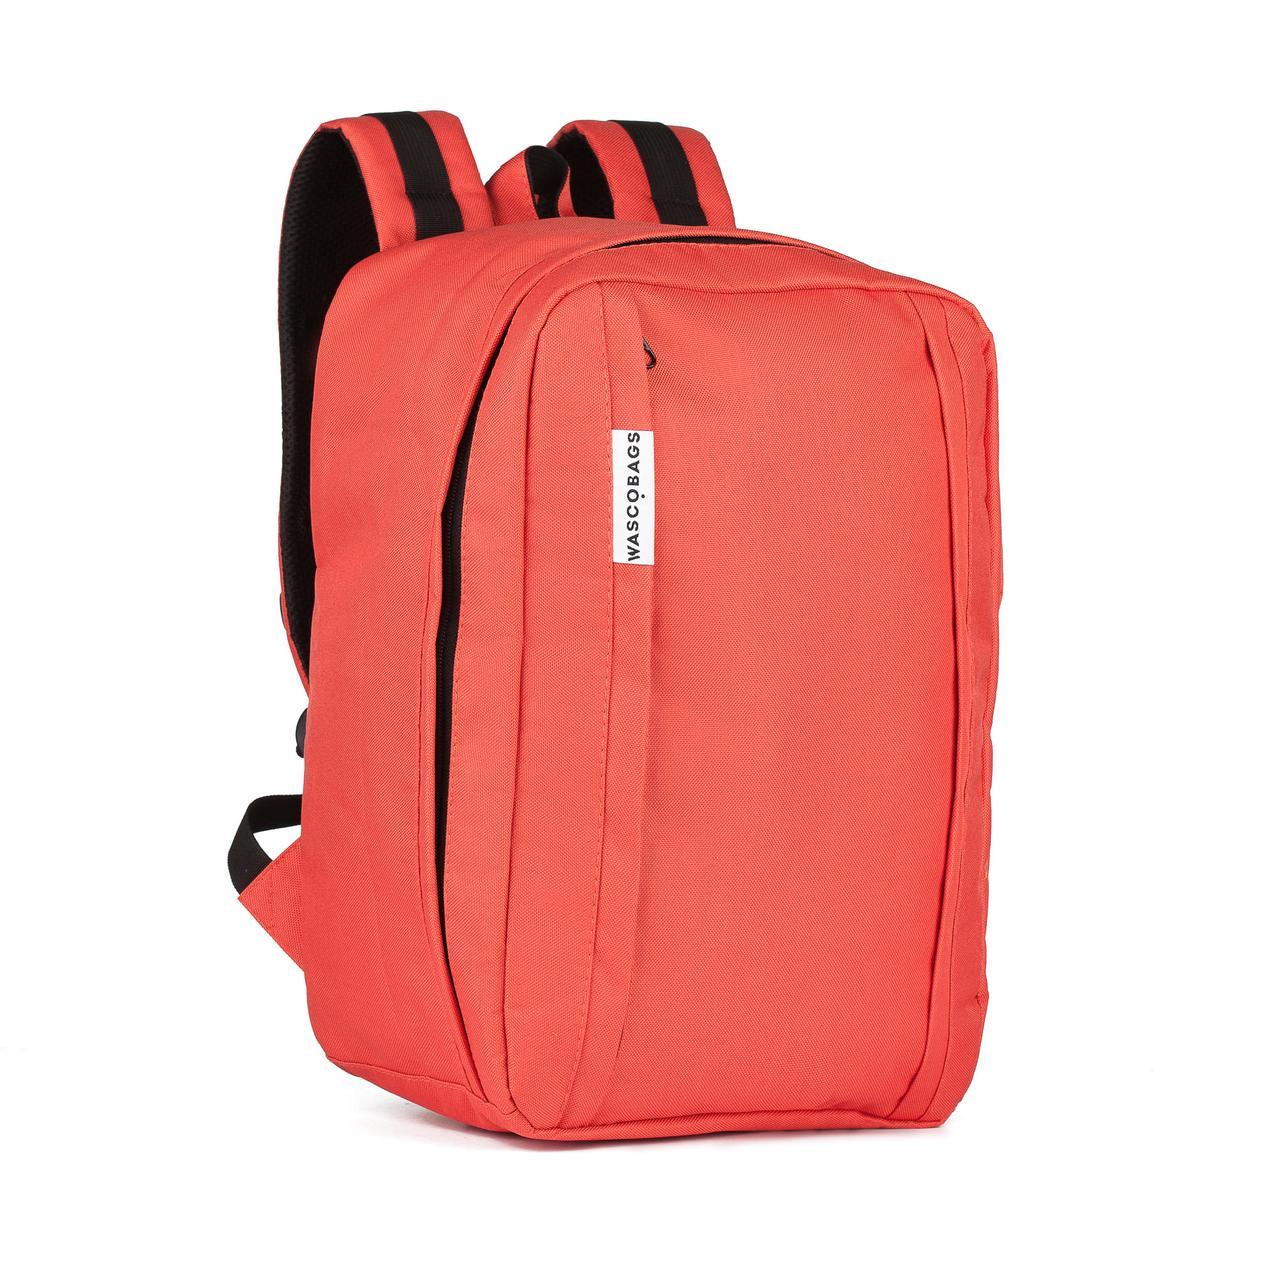 Рюкзак ручная кладь WascoBags 40x30x20 см. WZ Coral коралловый